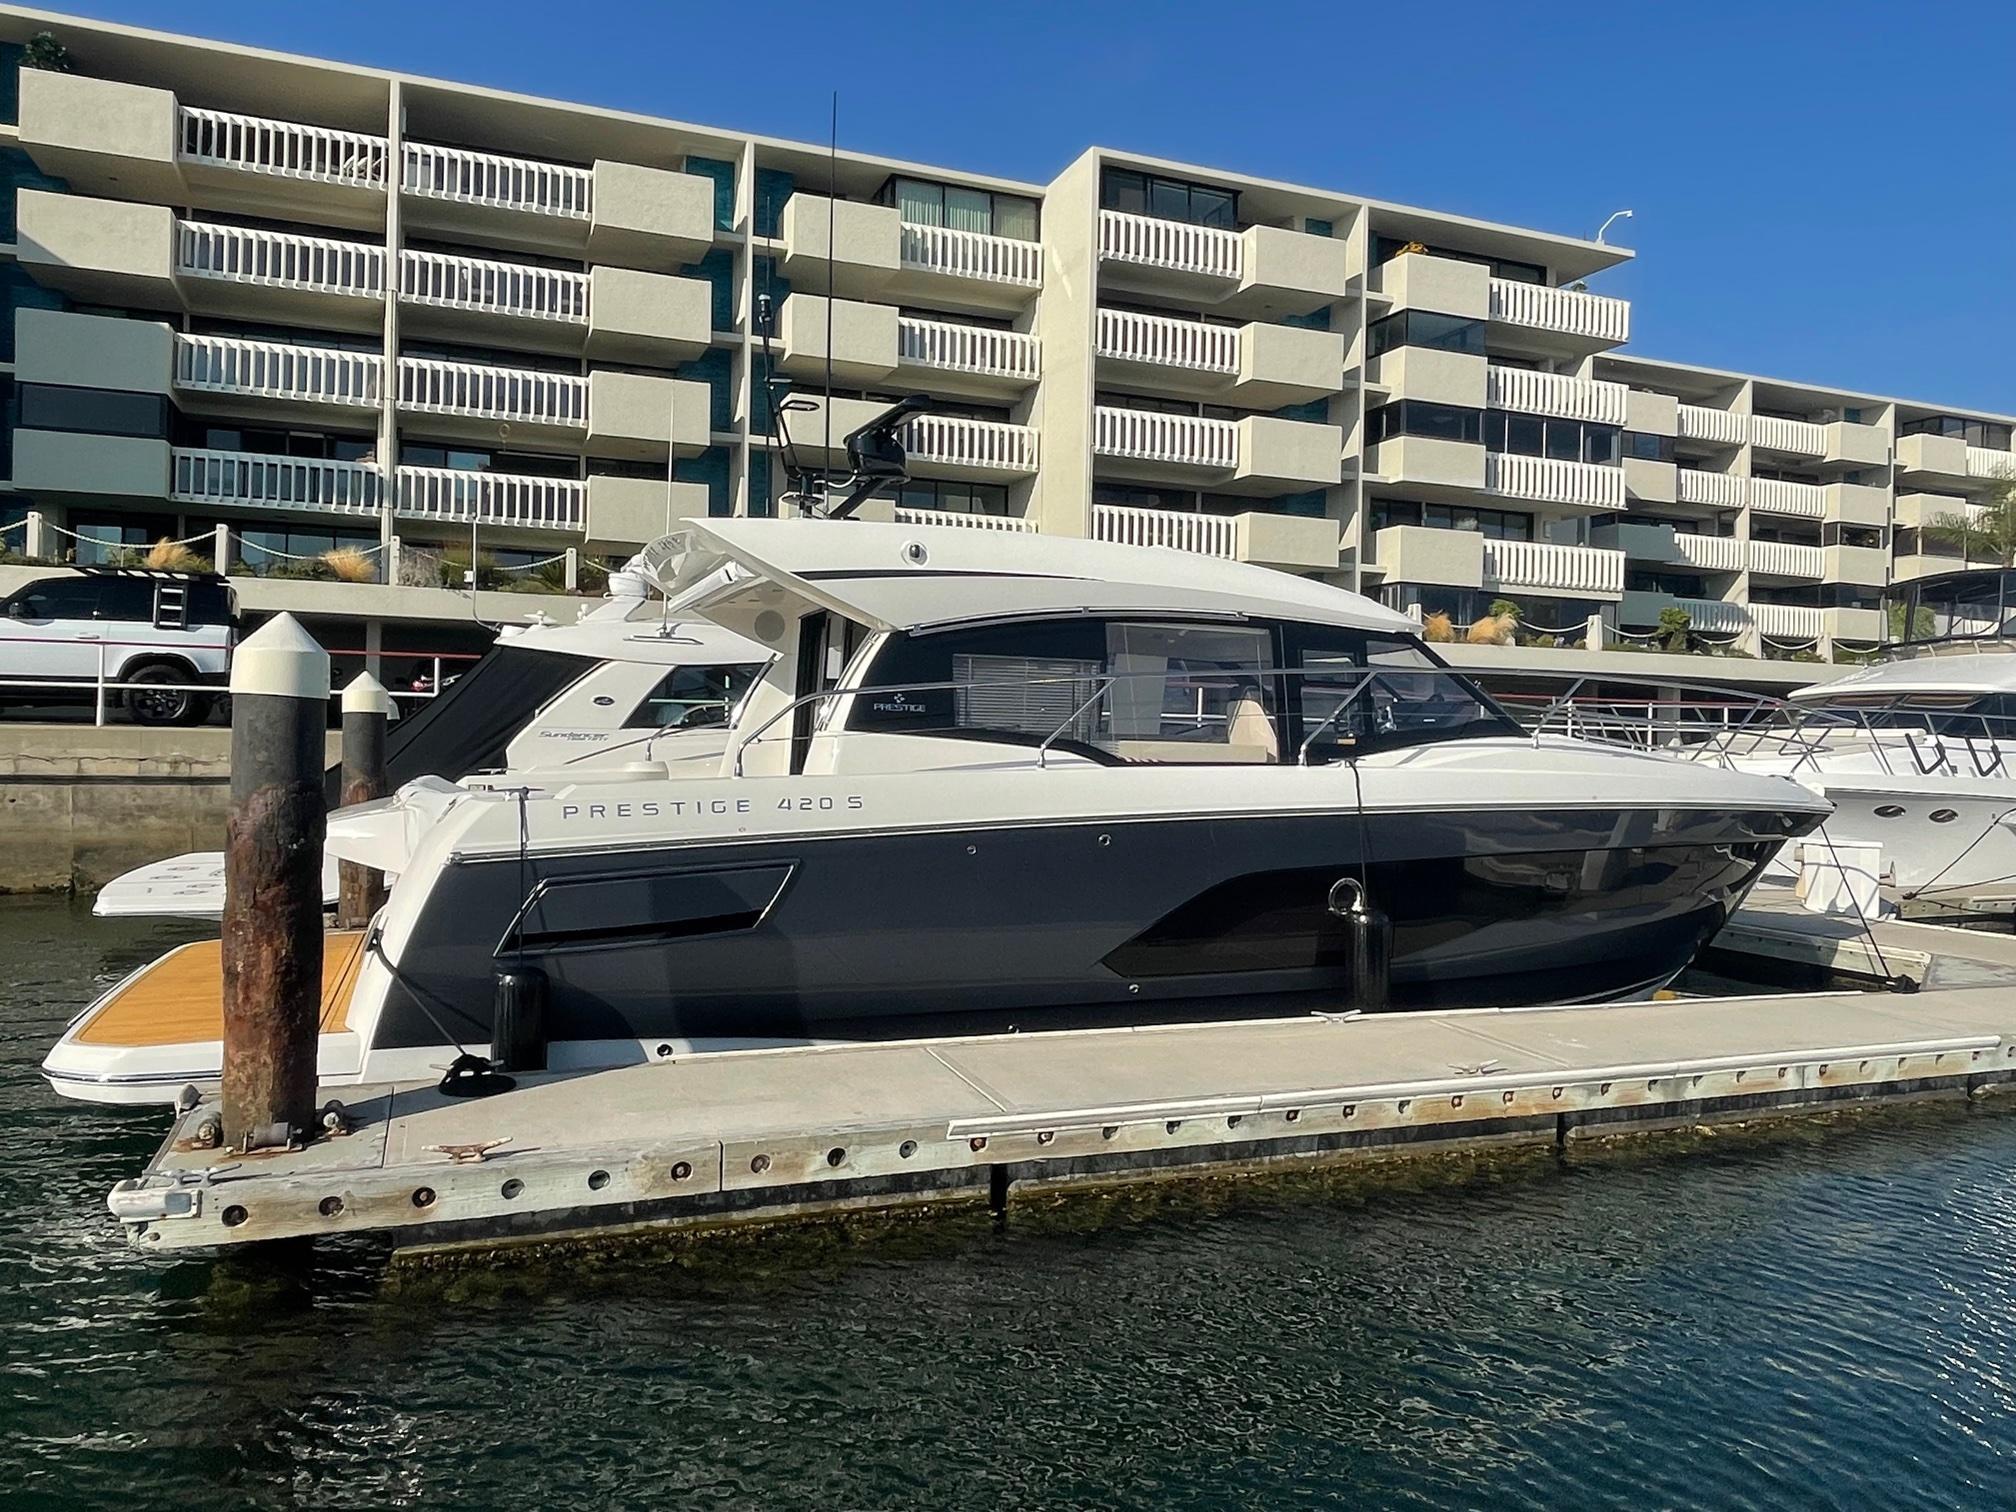 2020 Prestige 420 S #TB004BB-LLC inventory image at Sun Country Coastal in Newport Beach